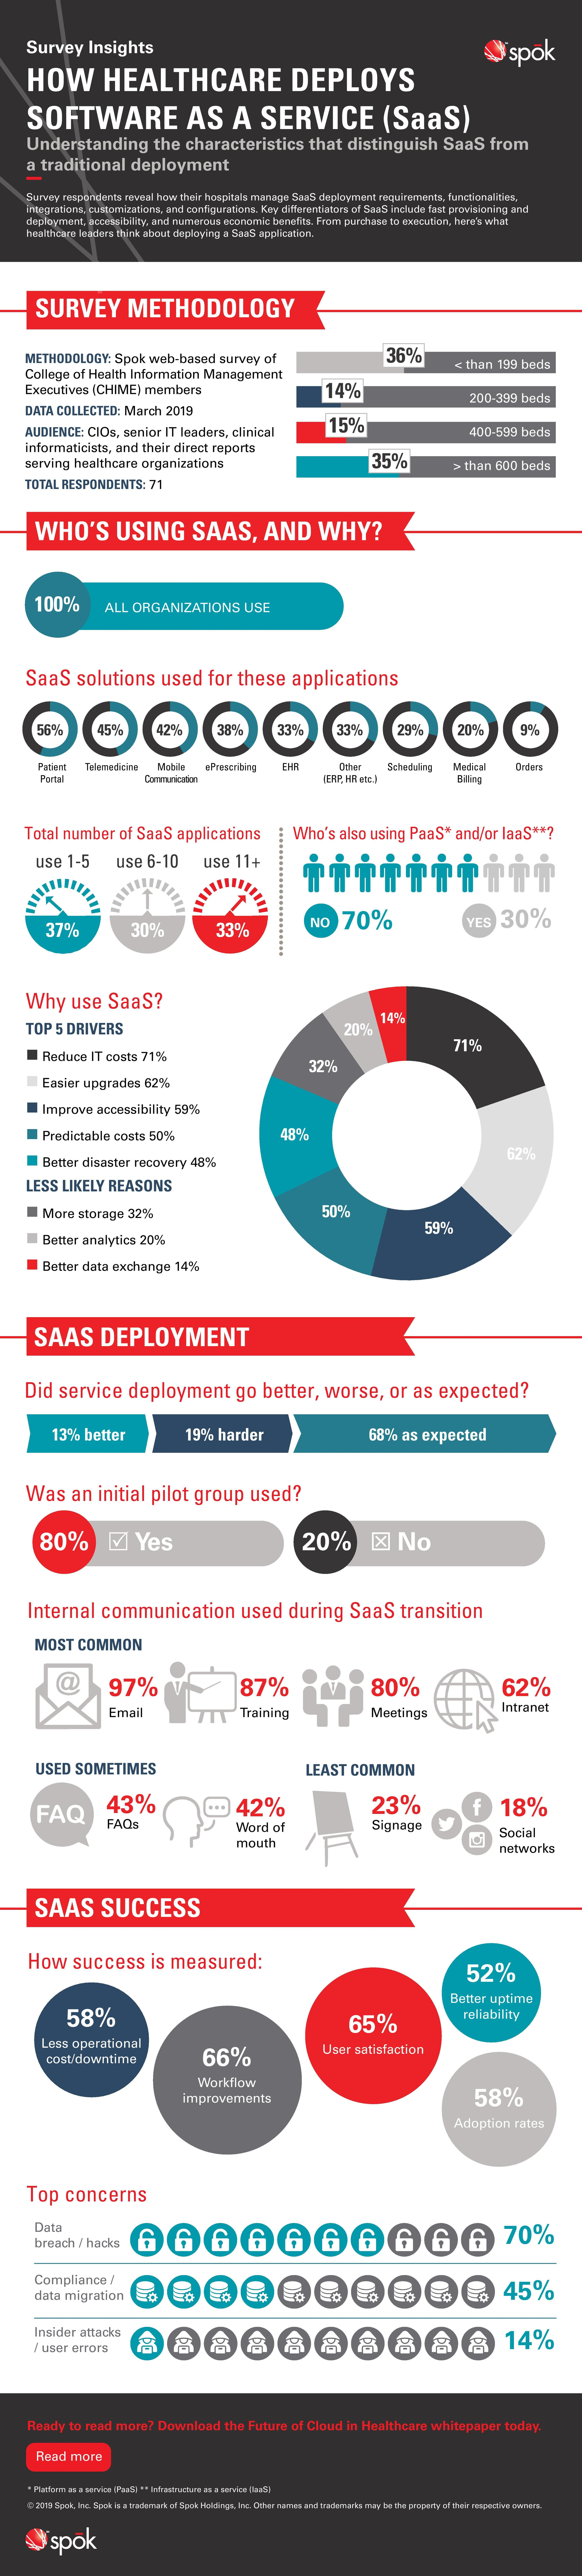 Survey How Healthcare Deploys Software as a Service (SaaS